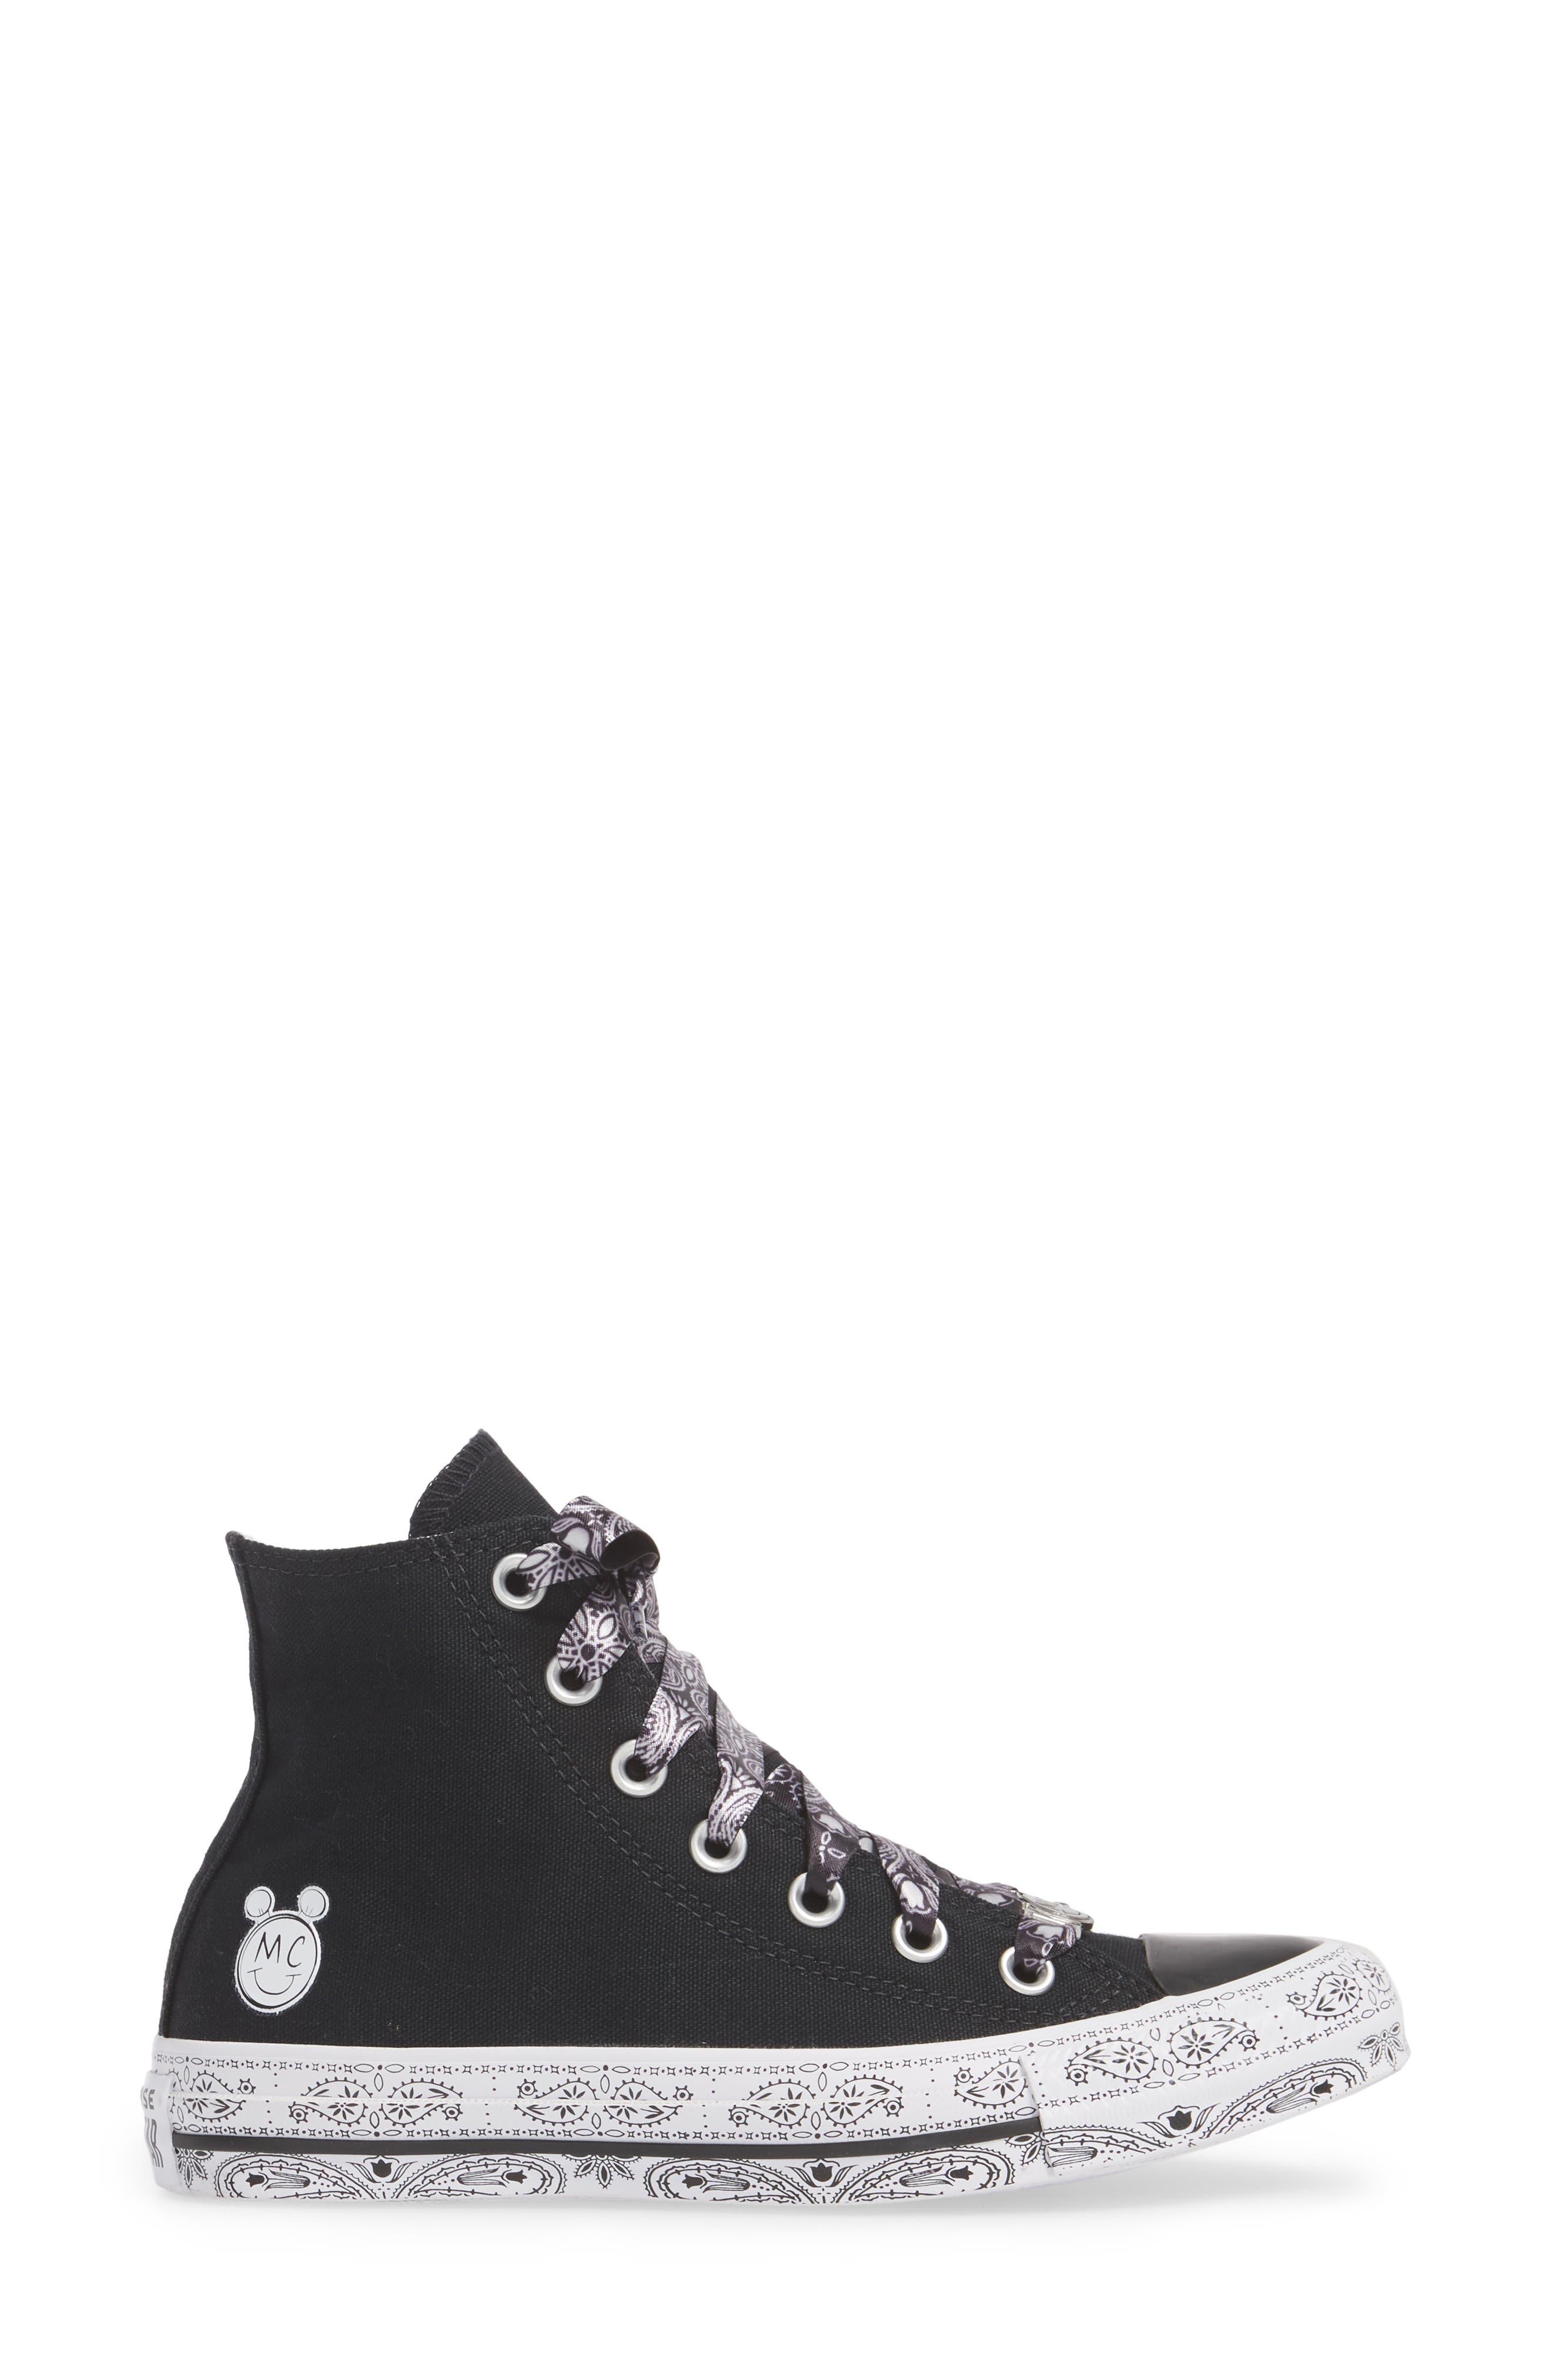 CONVERSE,                             x Miley Cyrus Chuck Taylor All Star Bandana High Top Sneaker,                             Alternate thumbnail 3, color,                             001